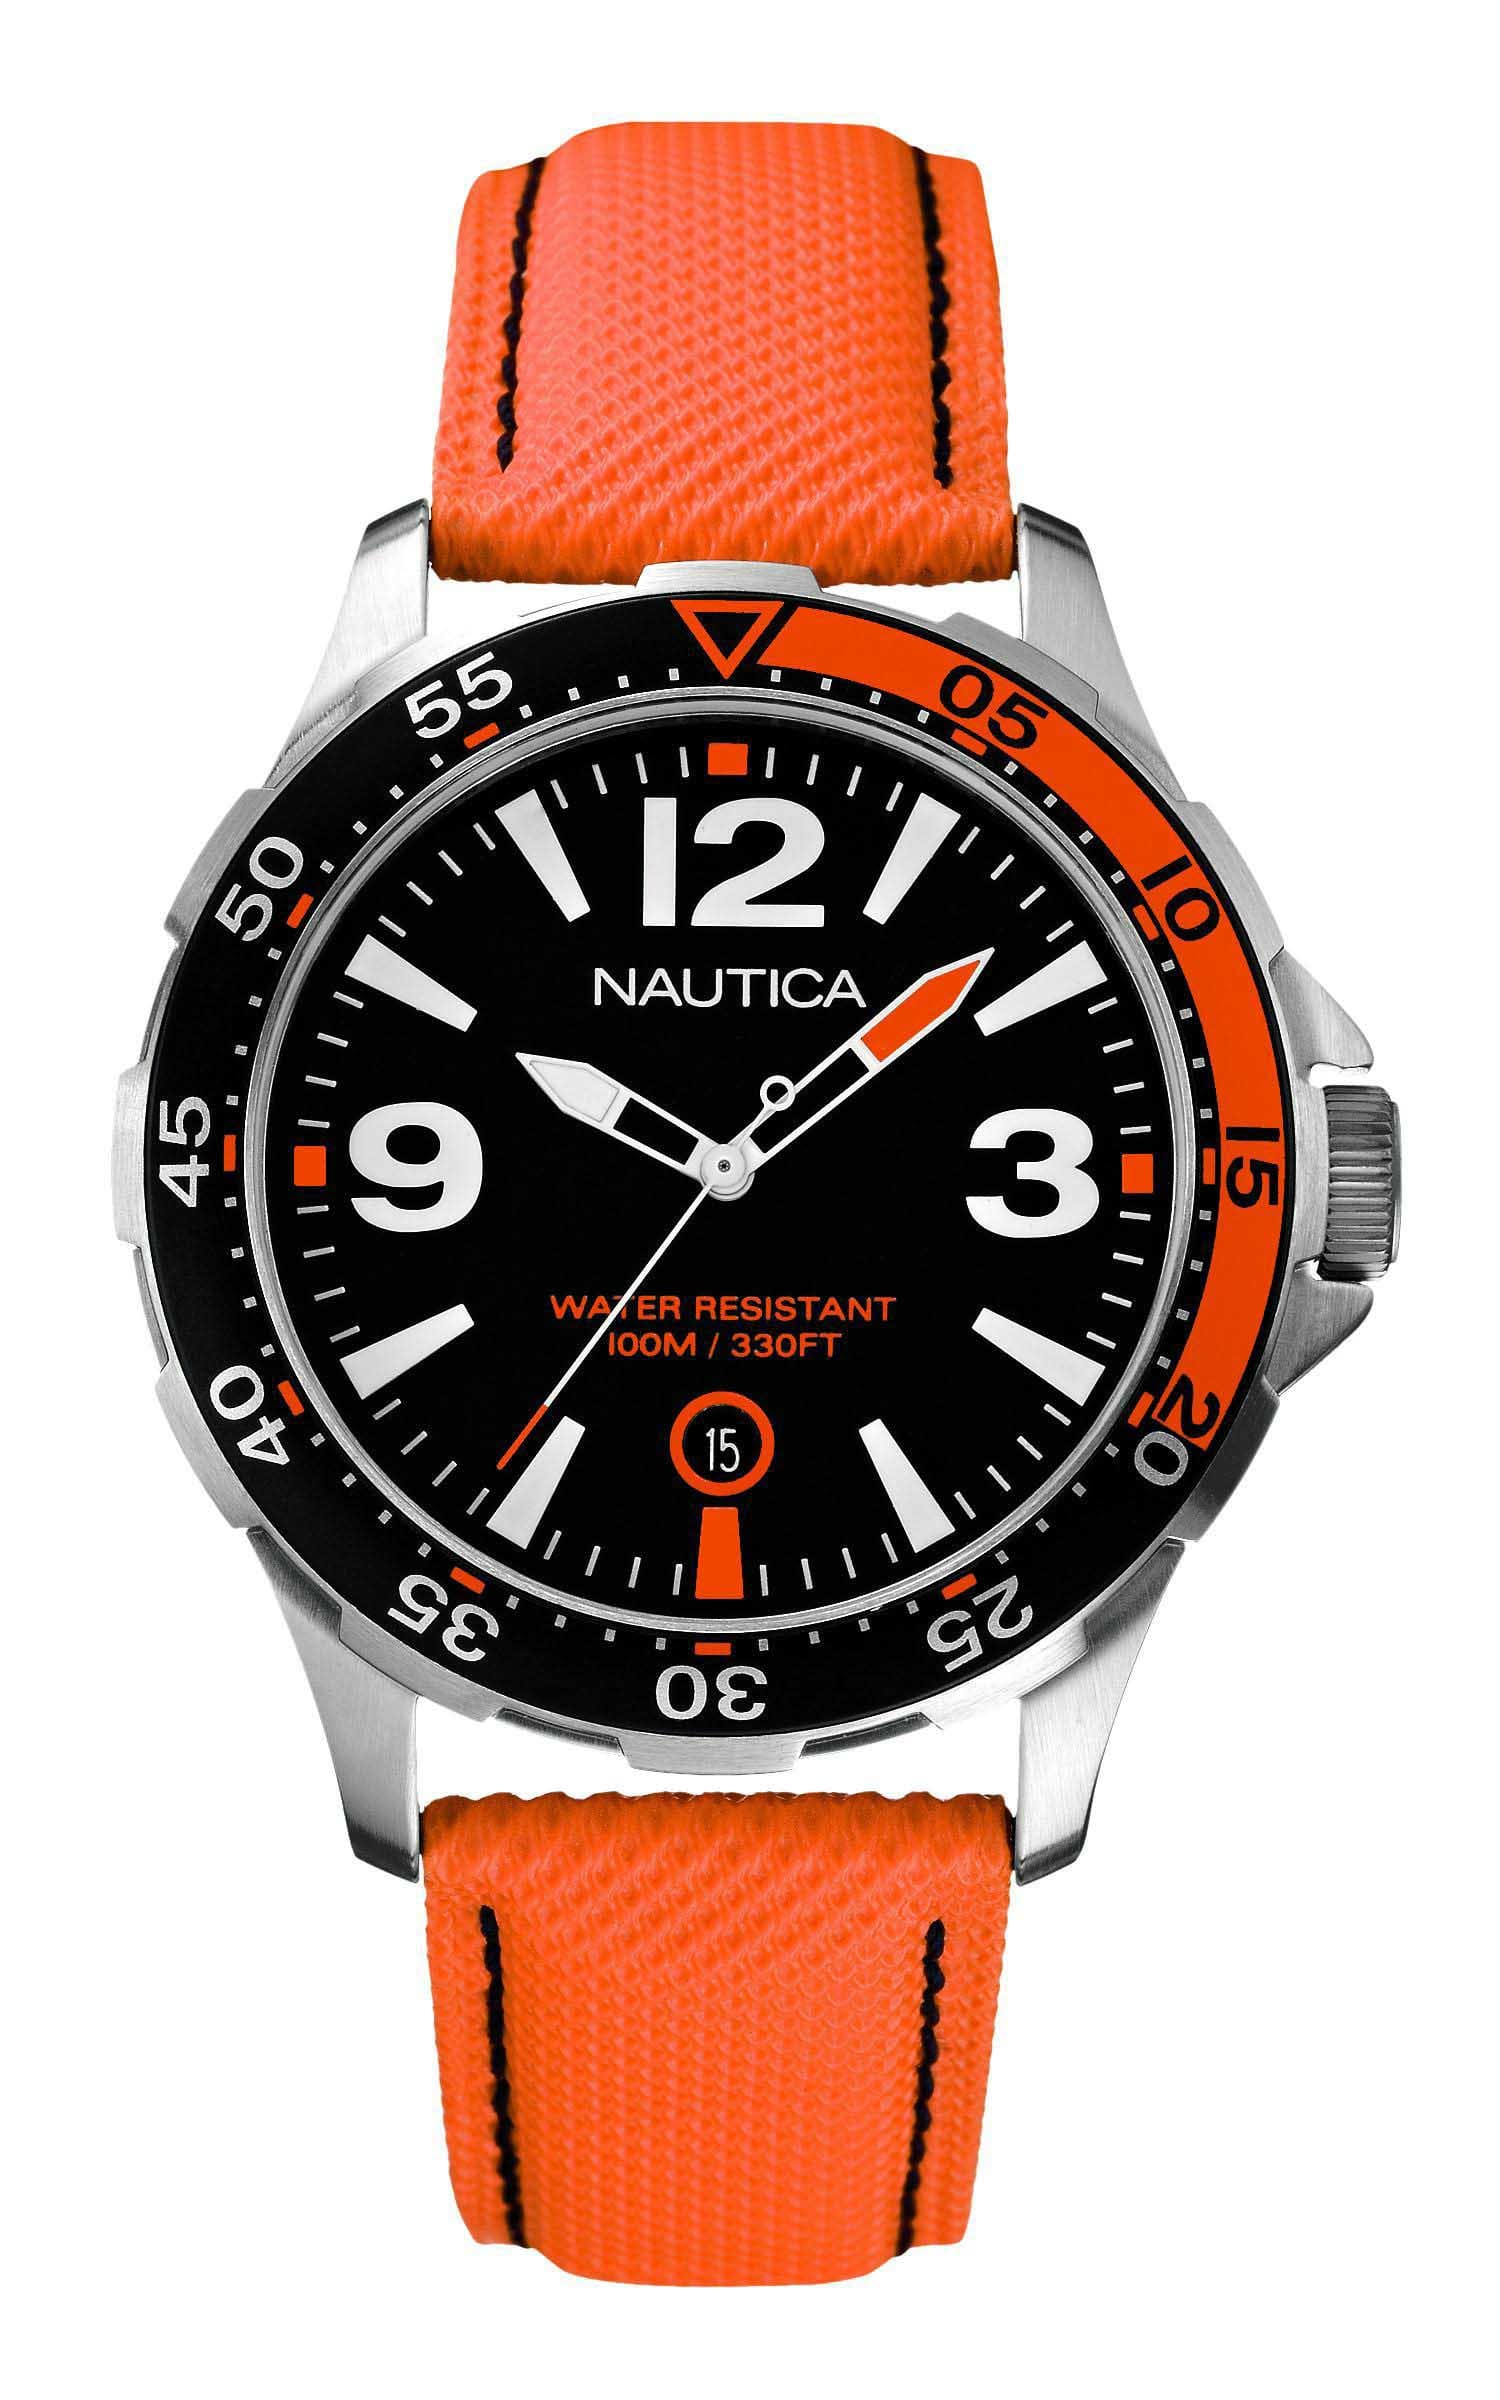 48aa76ce74b Relógio Nautica Masculino Nylon Laranja - A12578G